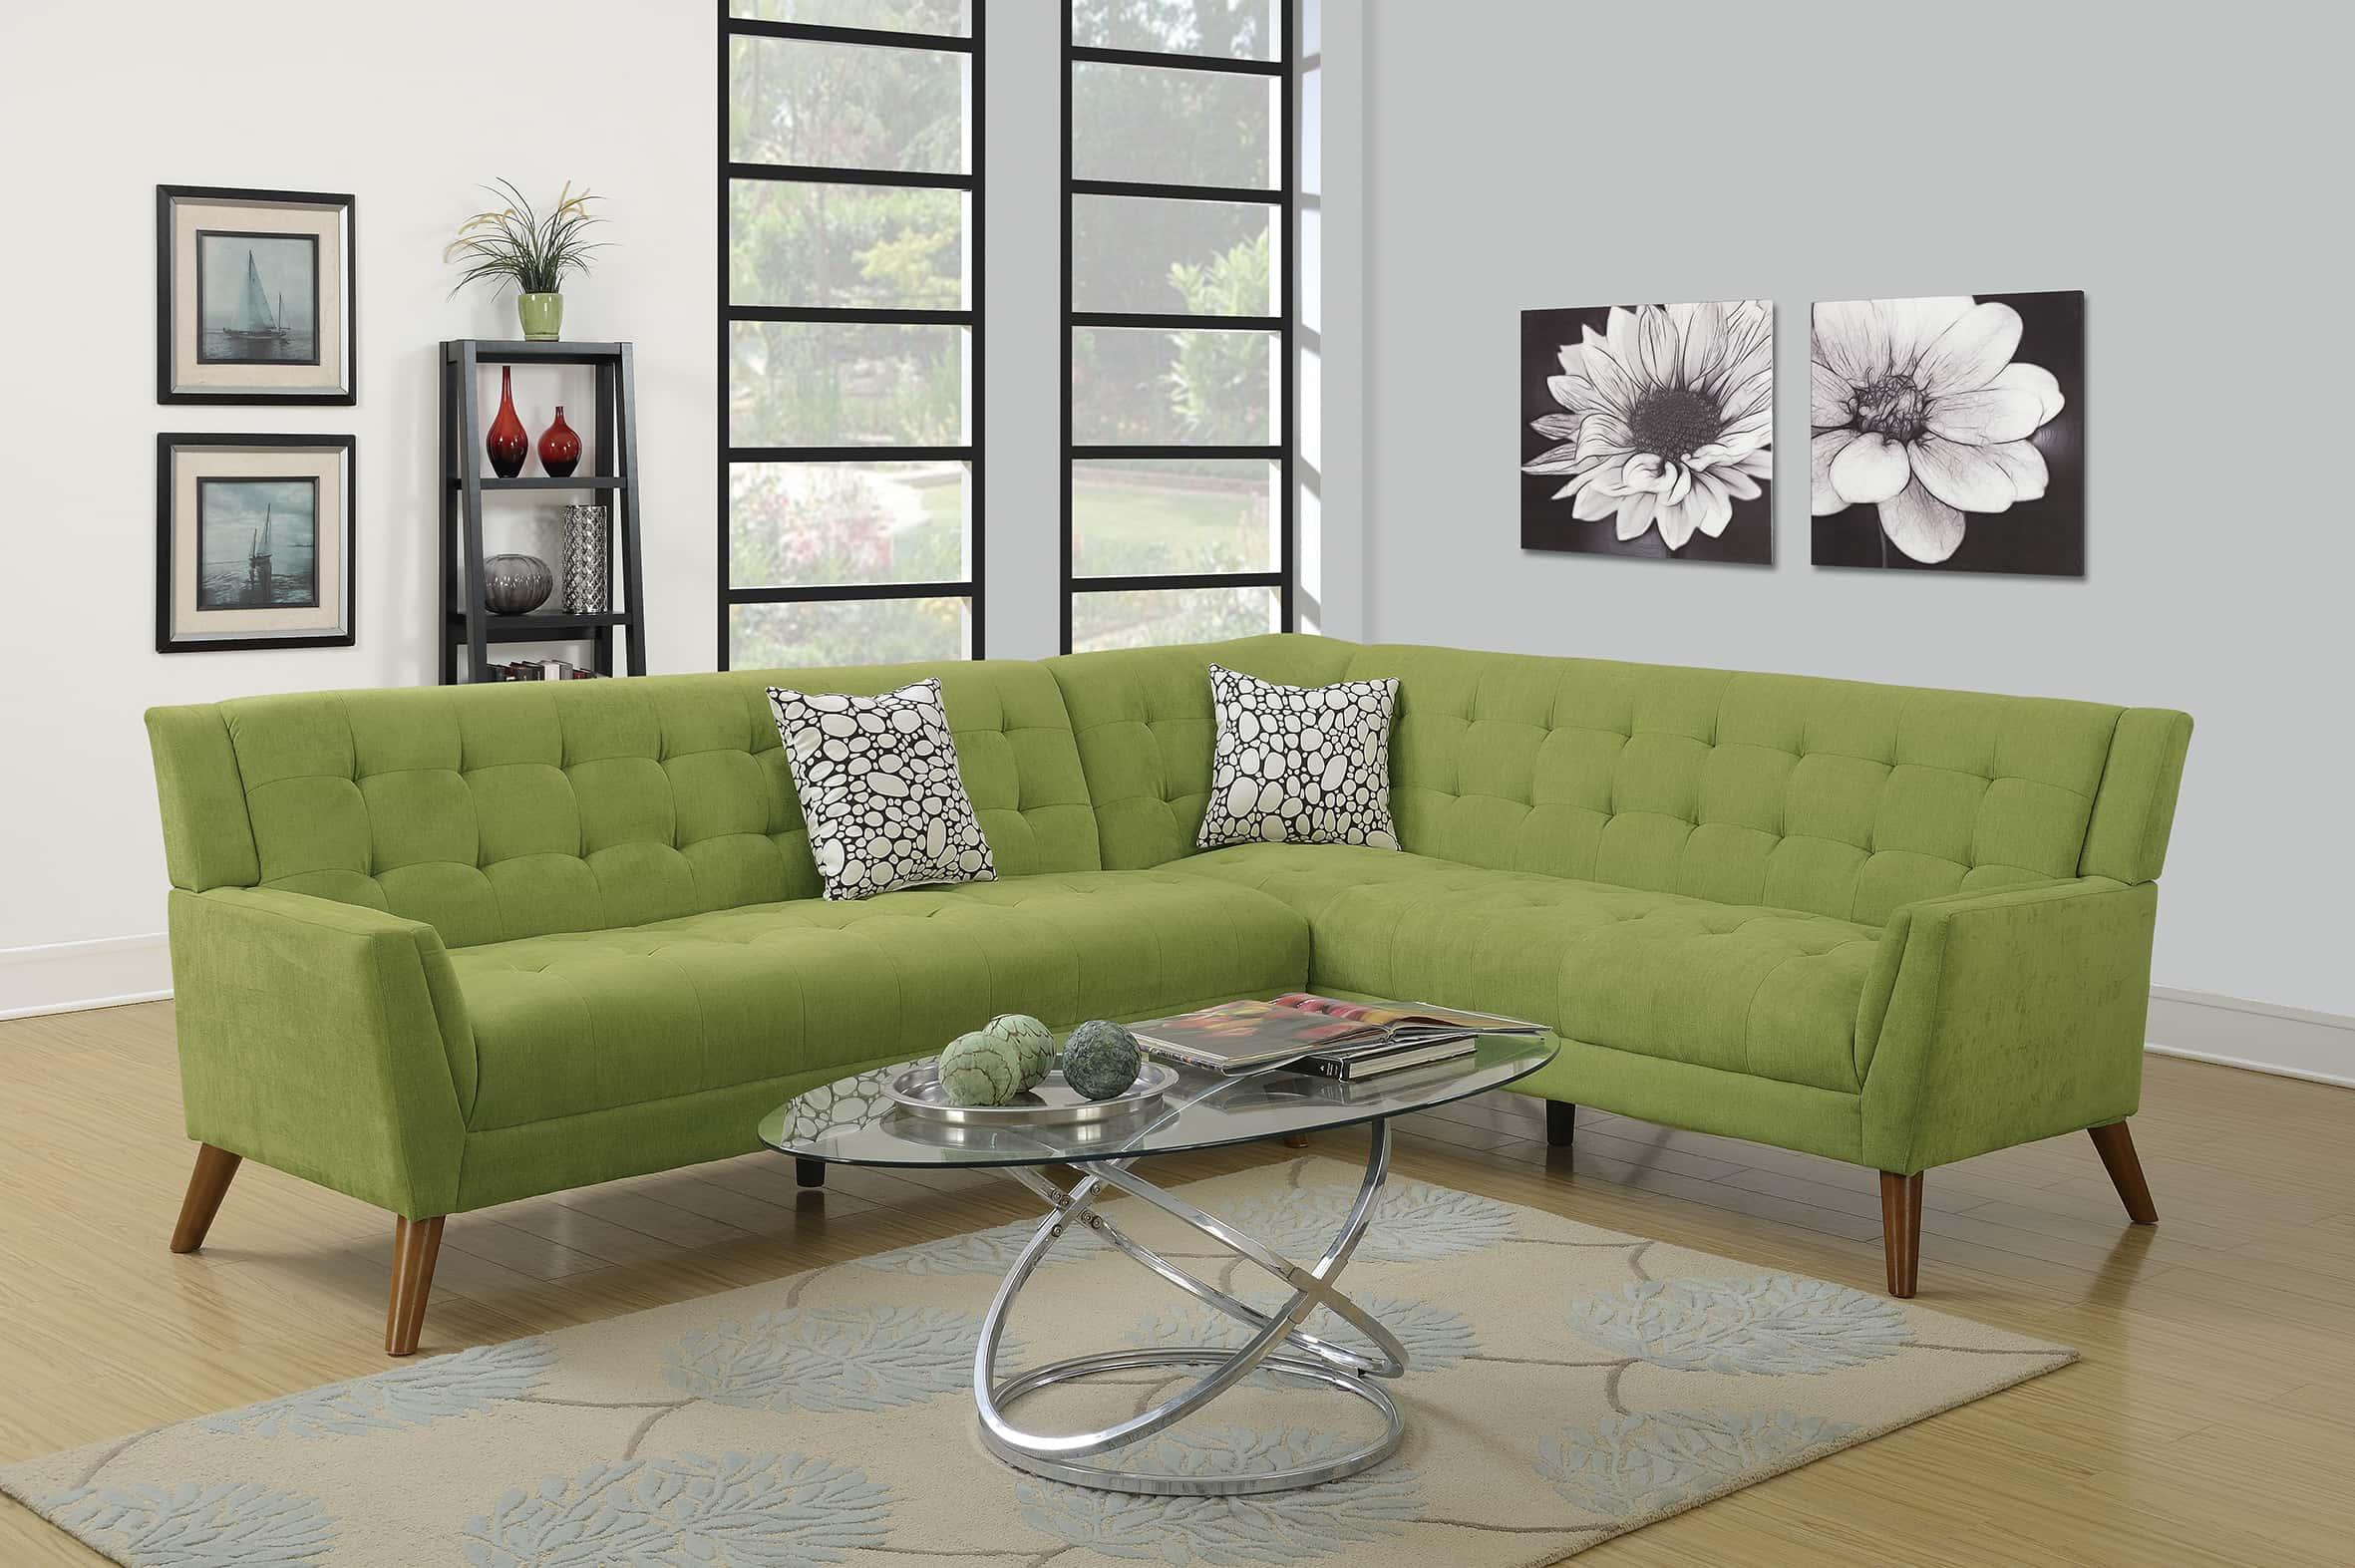 F6886 willow 2 pcs sectional sofa set